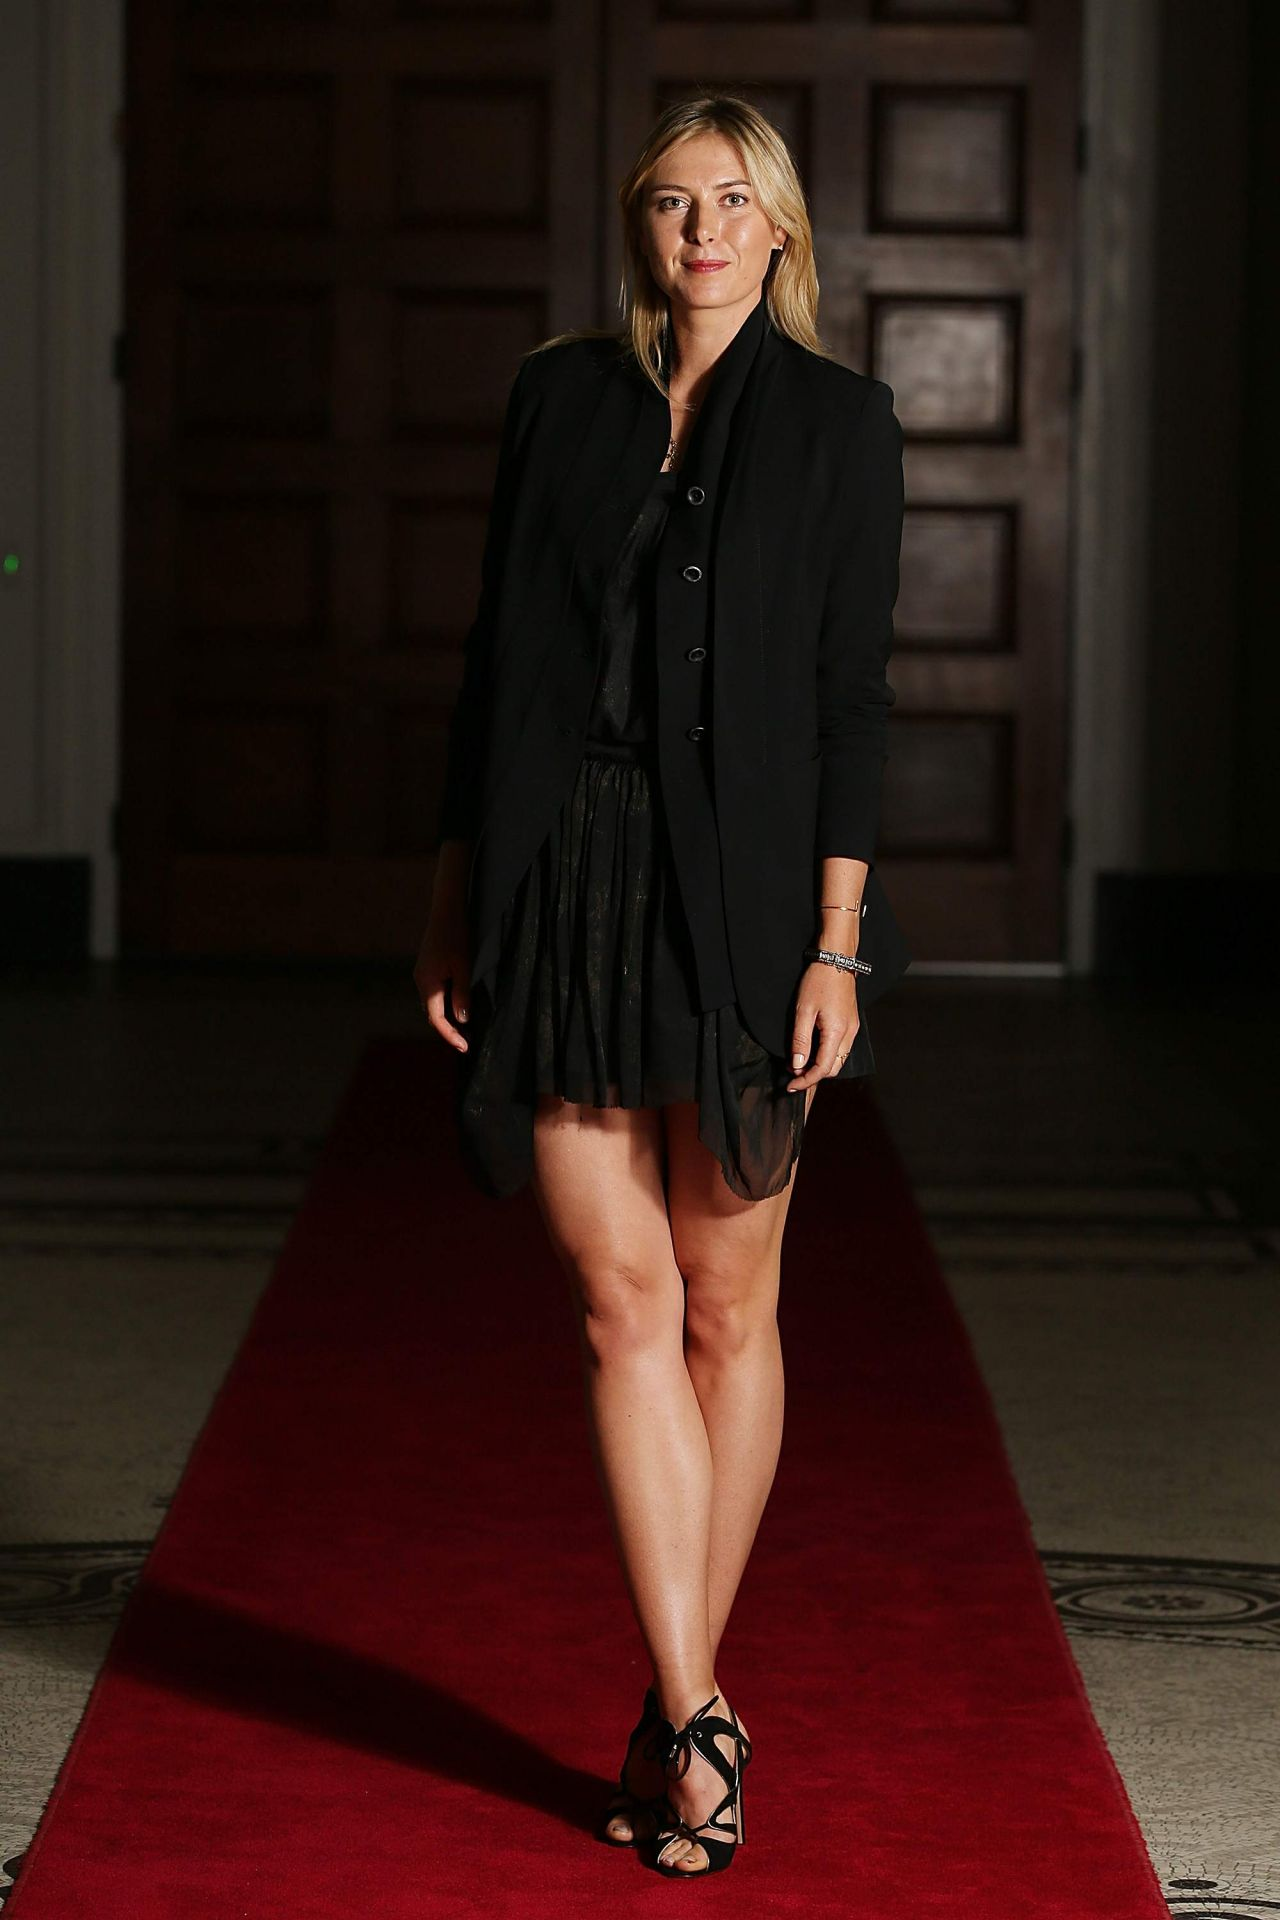 Maria Sharapova - Summer Nights Player Party At Brisbane -3562